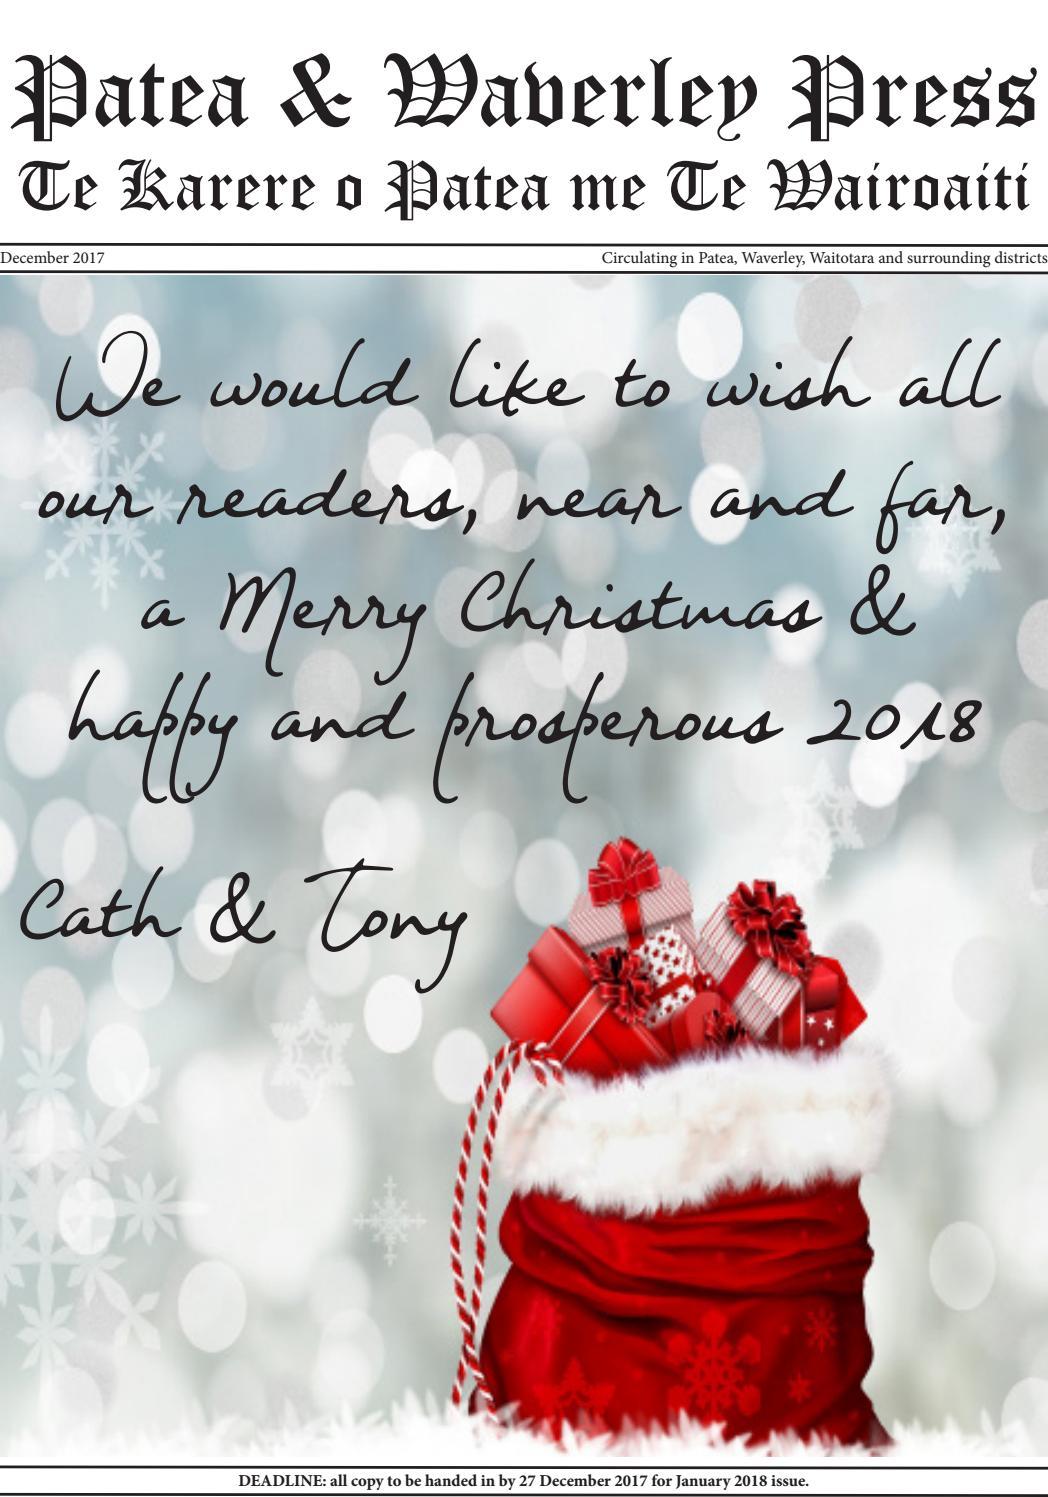 Patea & Waverley Press December 2017 by Cath Sheard - issuu